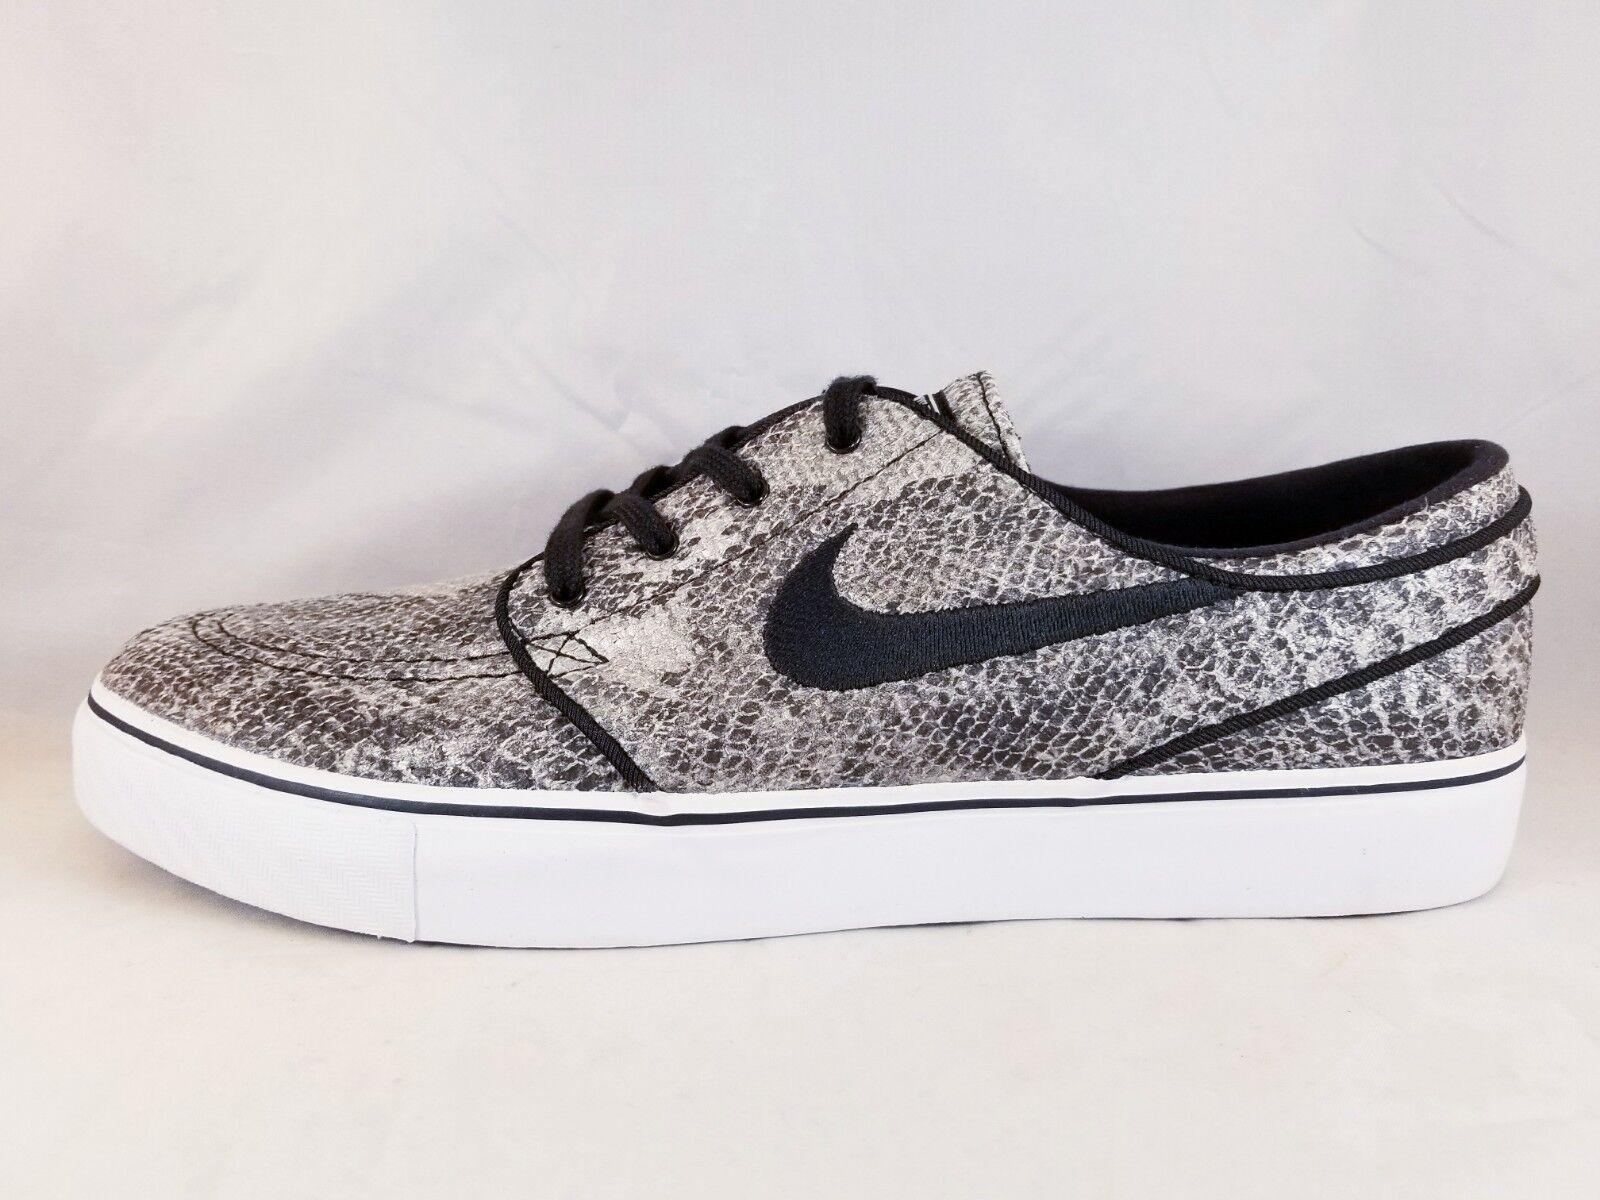 Nike Zoom Stefan Janoski Prem 855814 txt hombre skate zapatos 855814 Prem 003 comodo 60035d